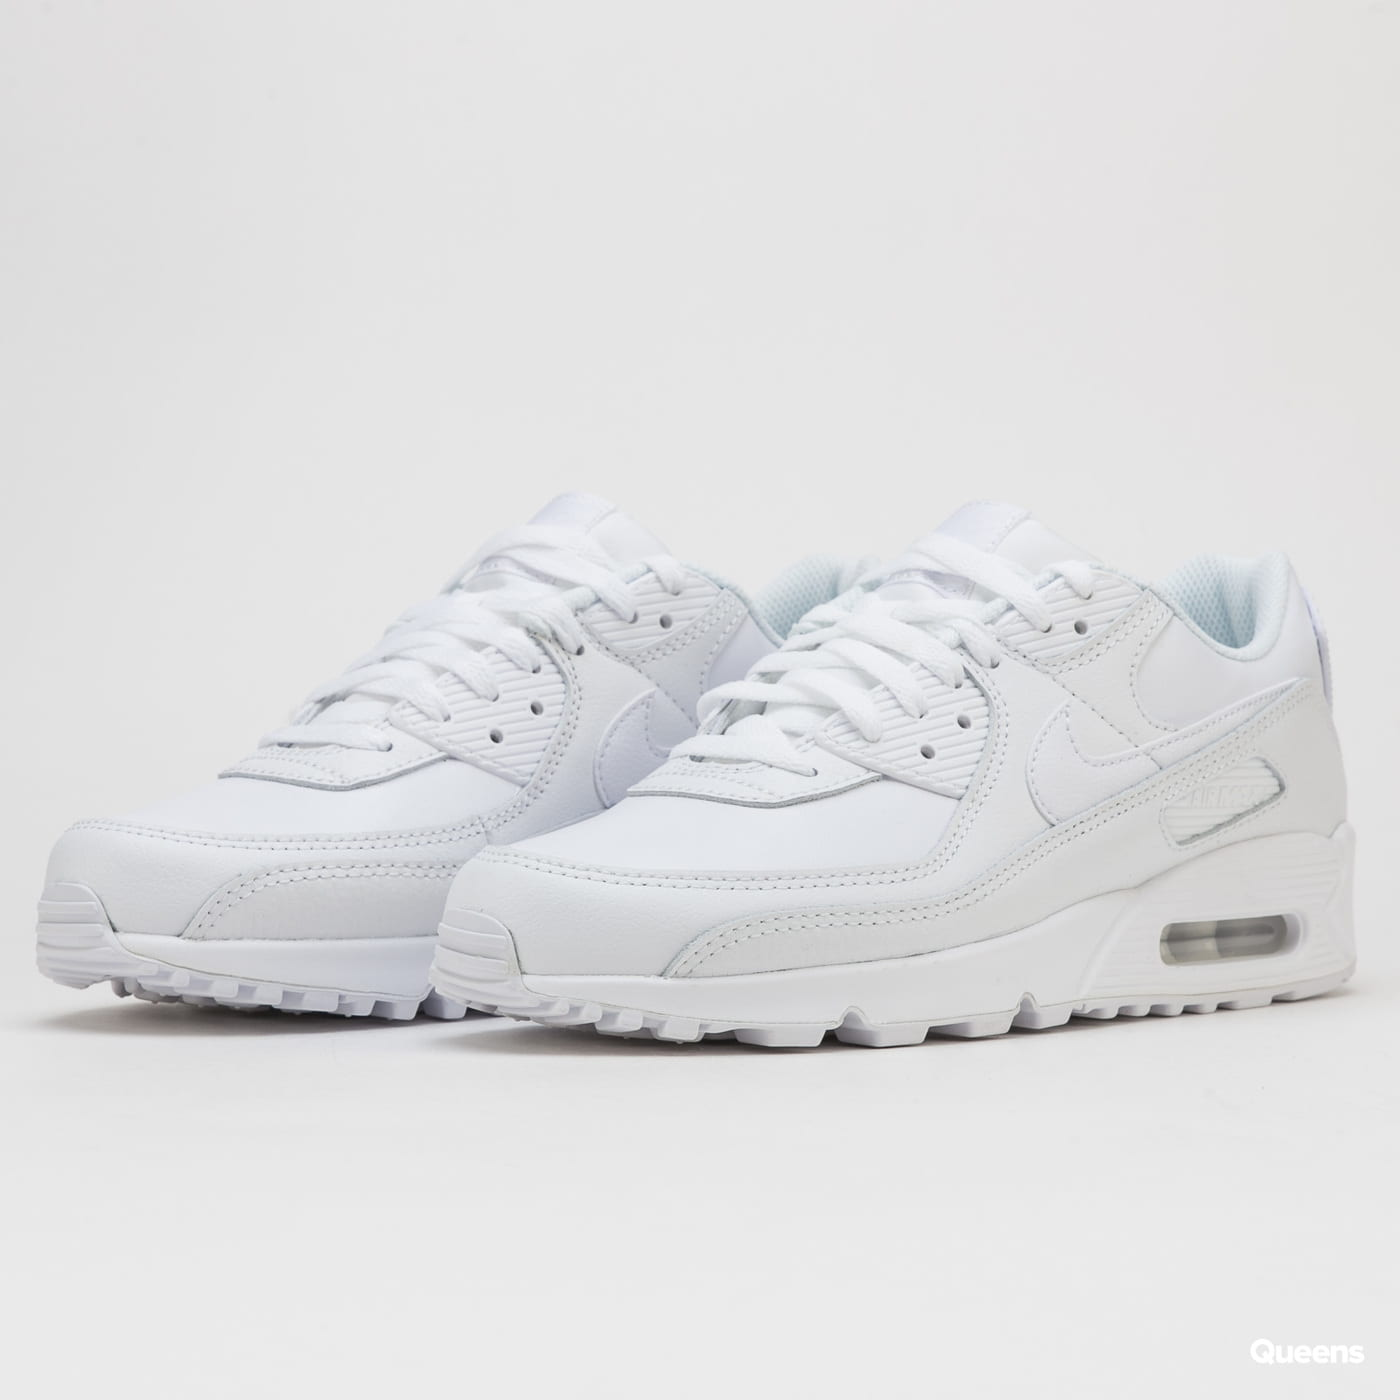 Nike Air Max 90 Leather white / white